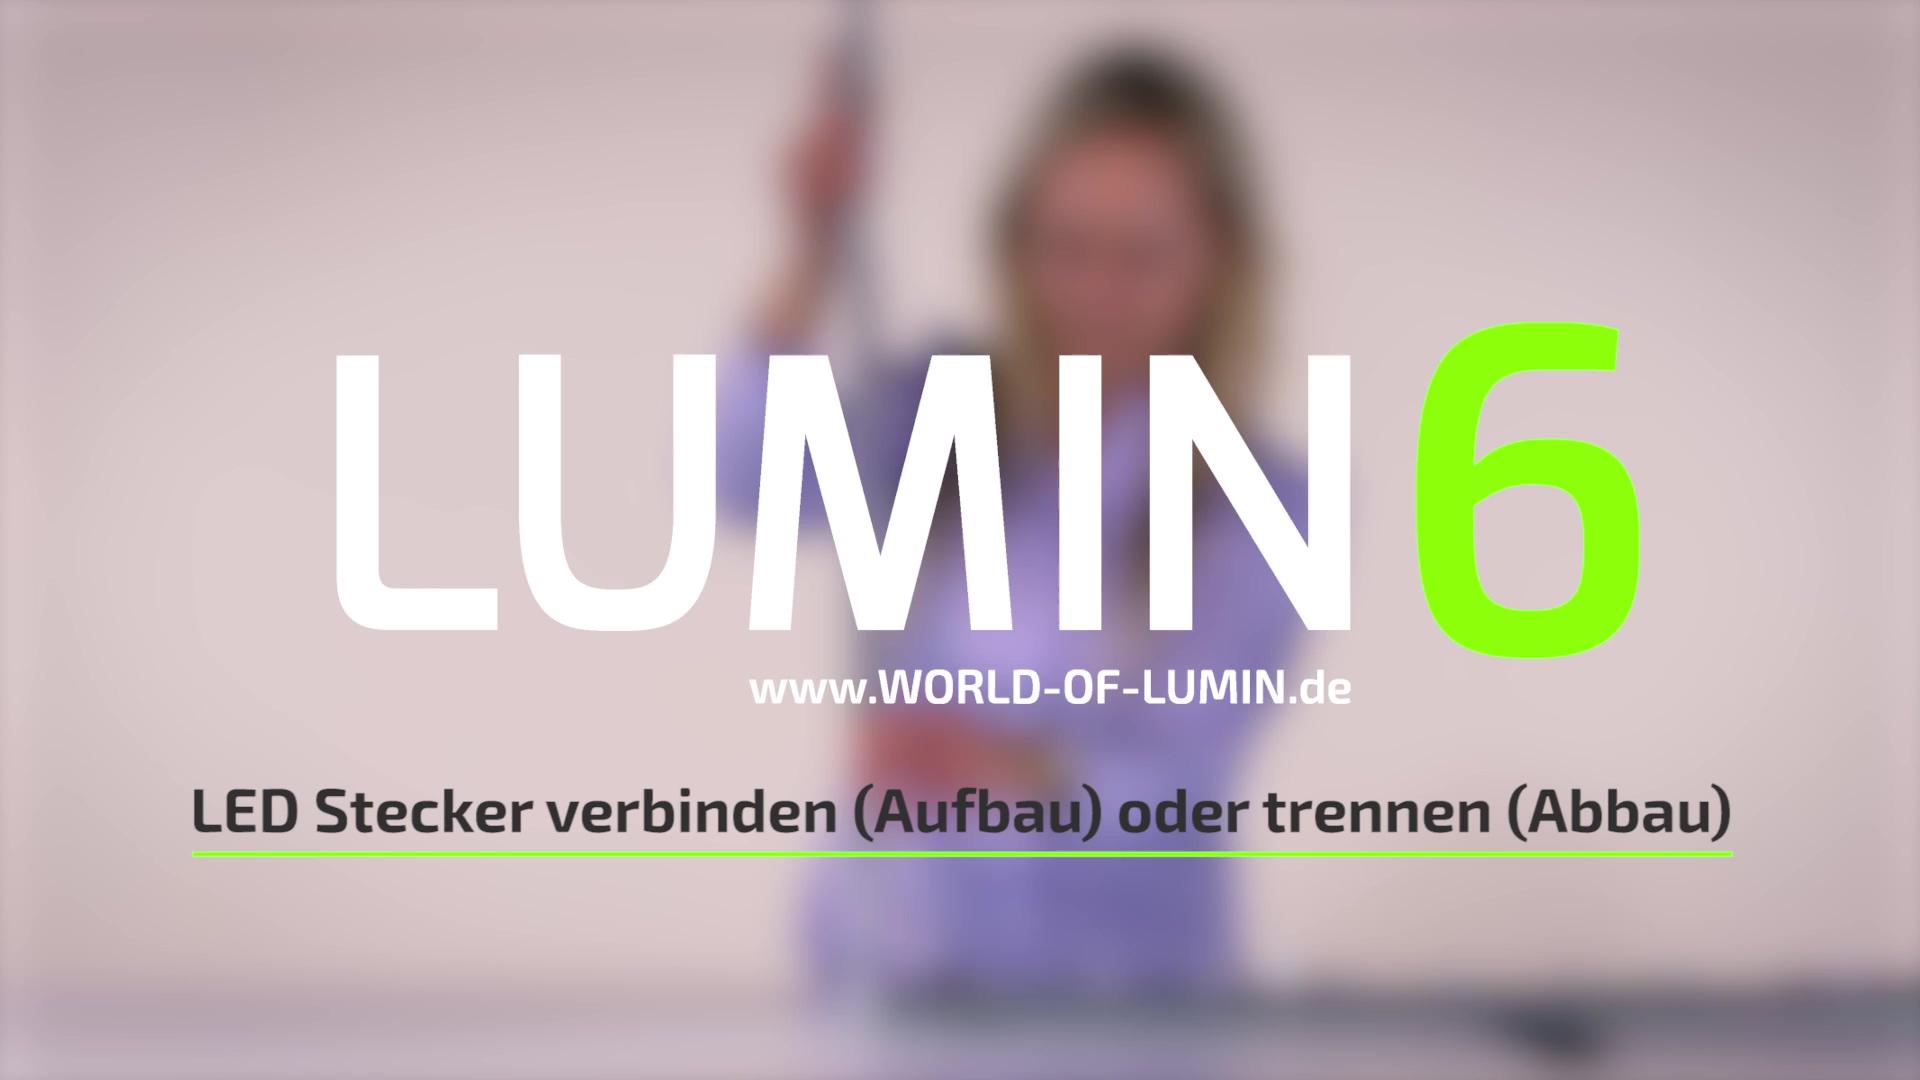 LaConcept_Lumin6_QR_LED-Stecker